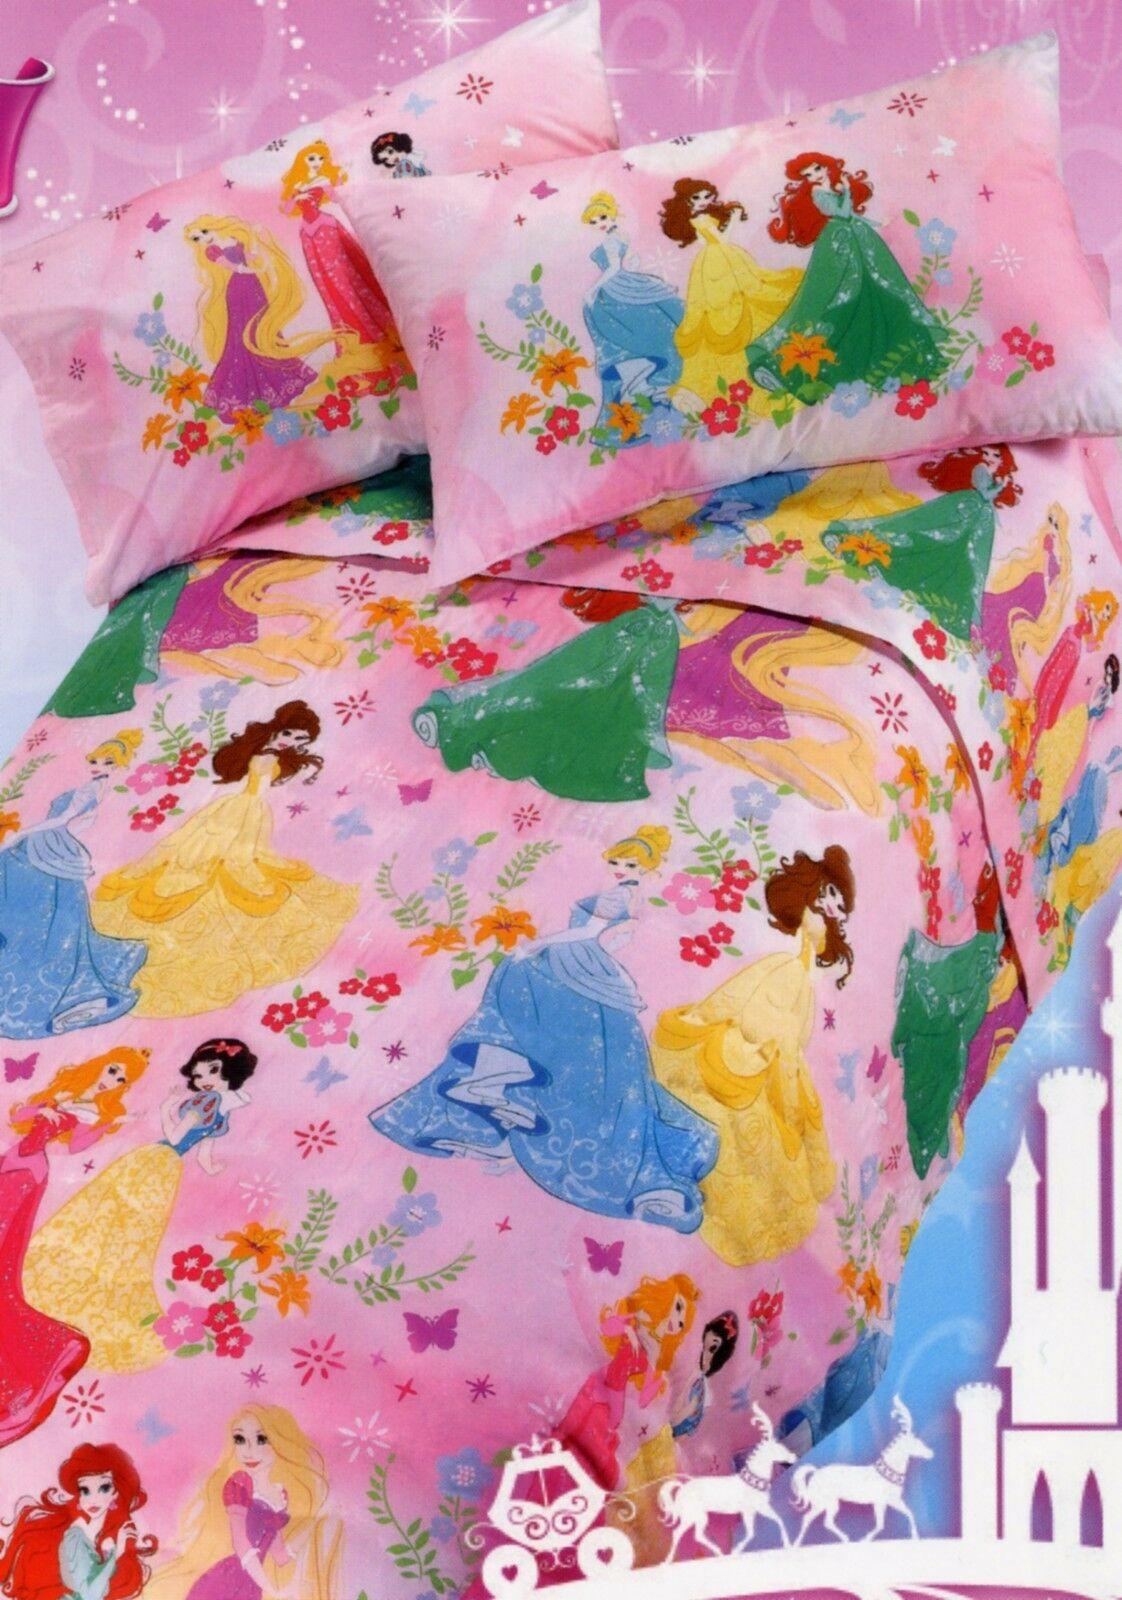 Lenzuola Delle Principesse Disney.Caleffi Lenzuola Disney Princess Cirinaroshop